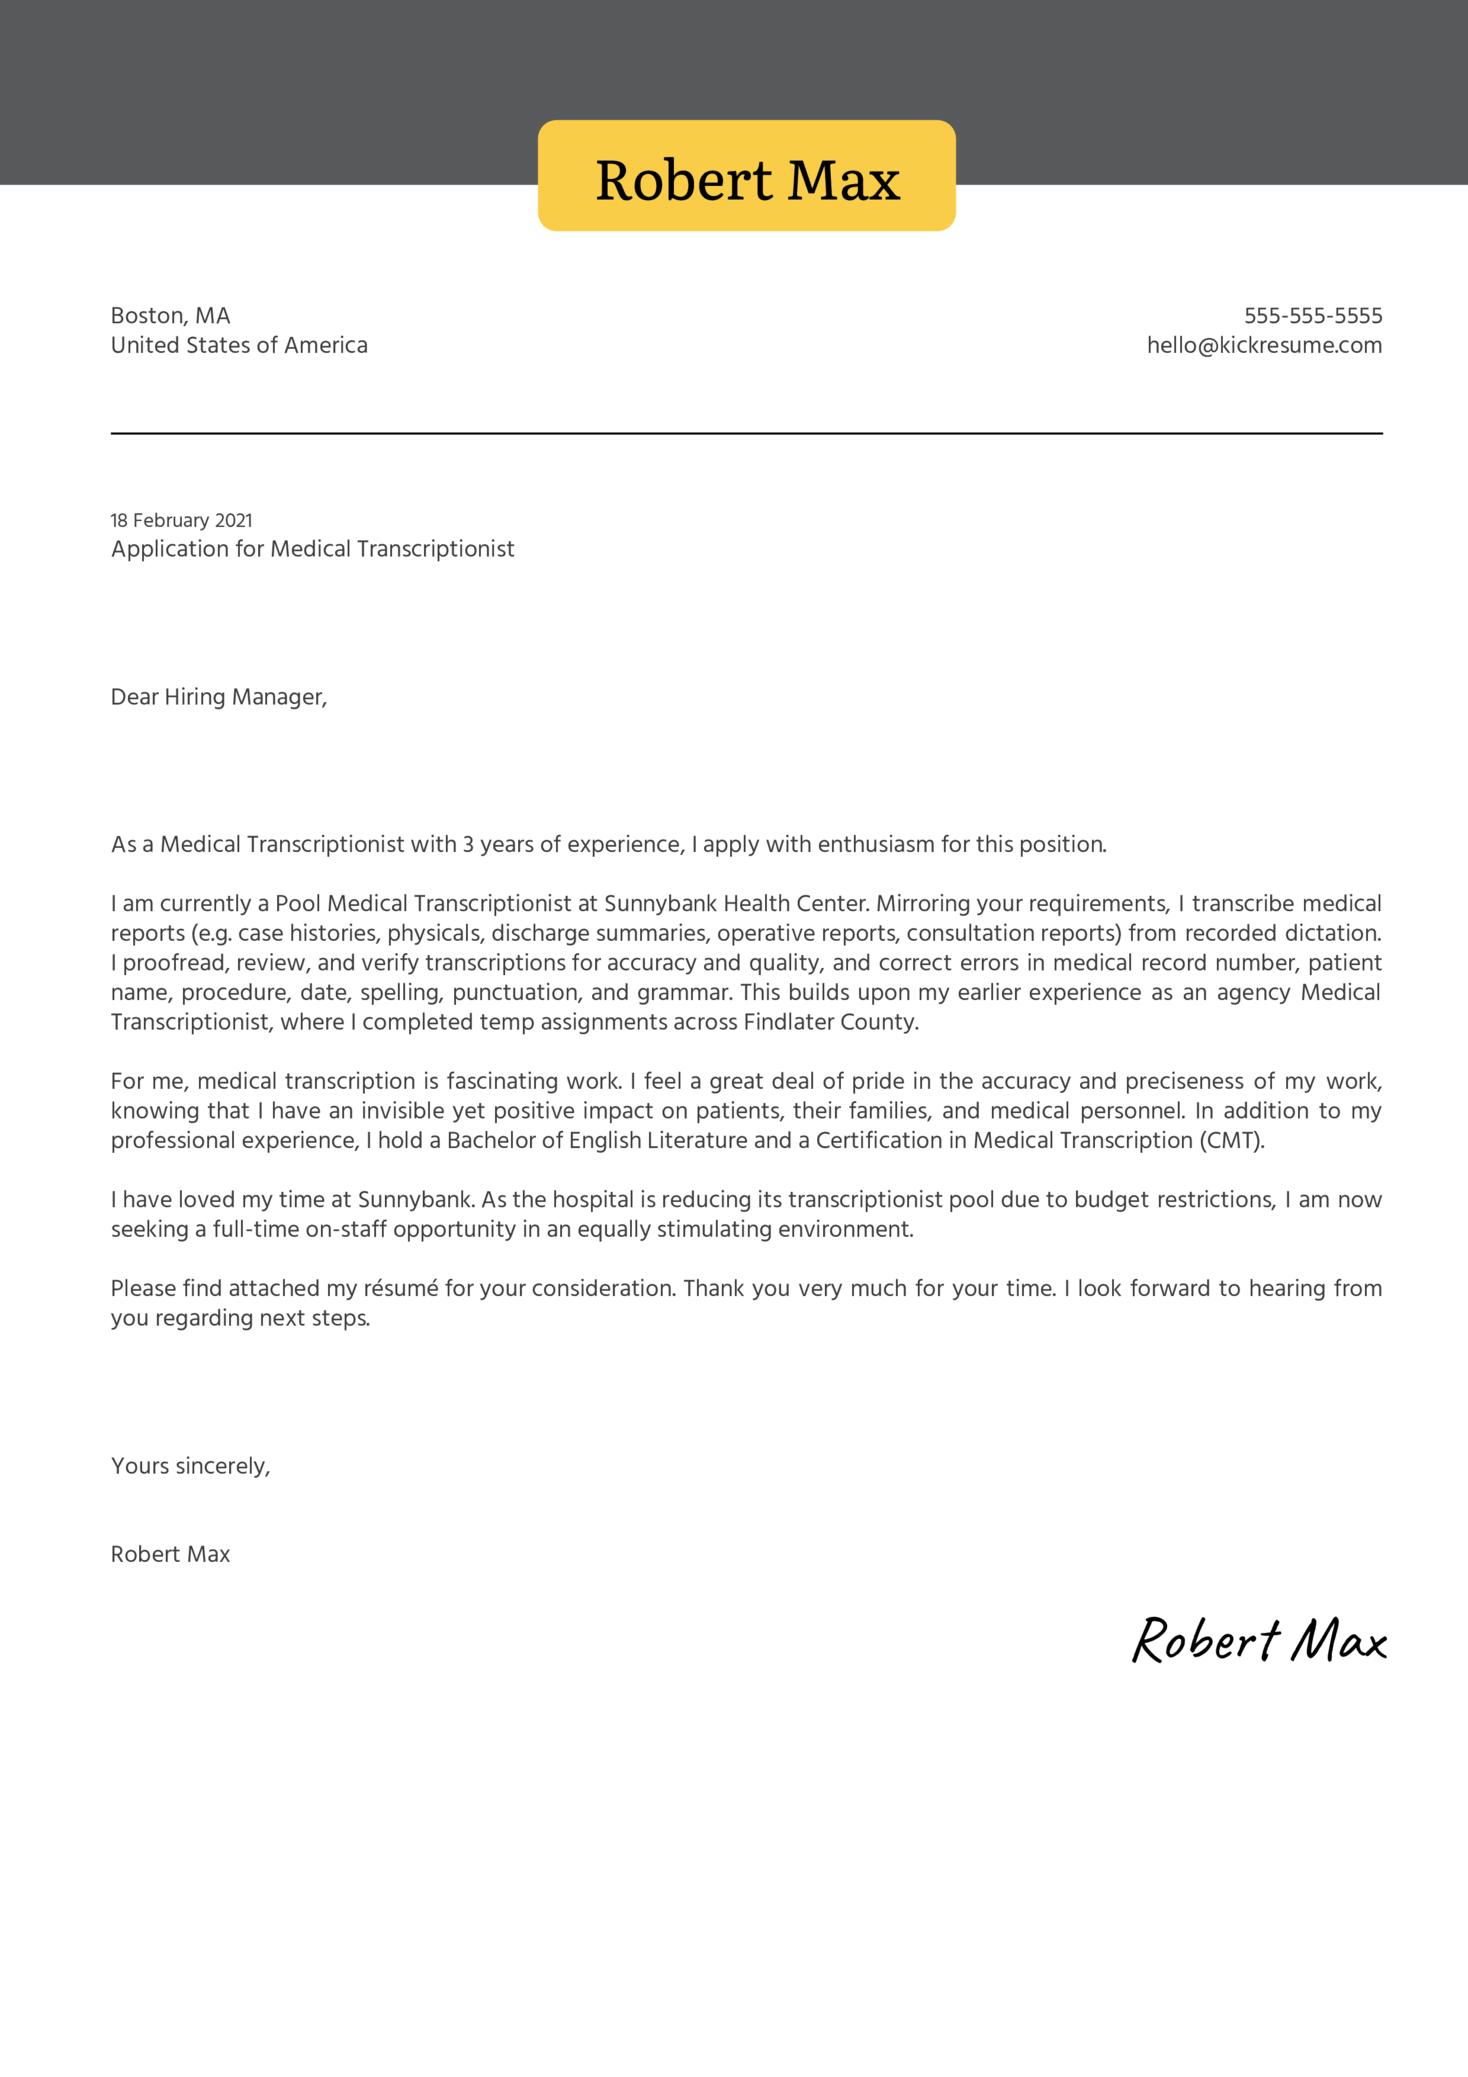 Medical Transcriptionist Cover Letter Sample